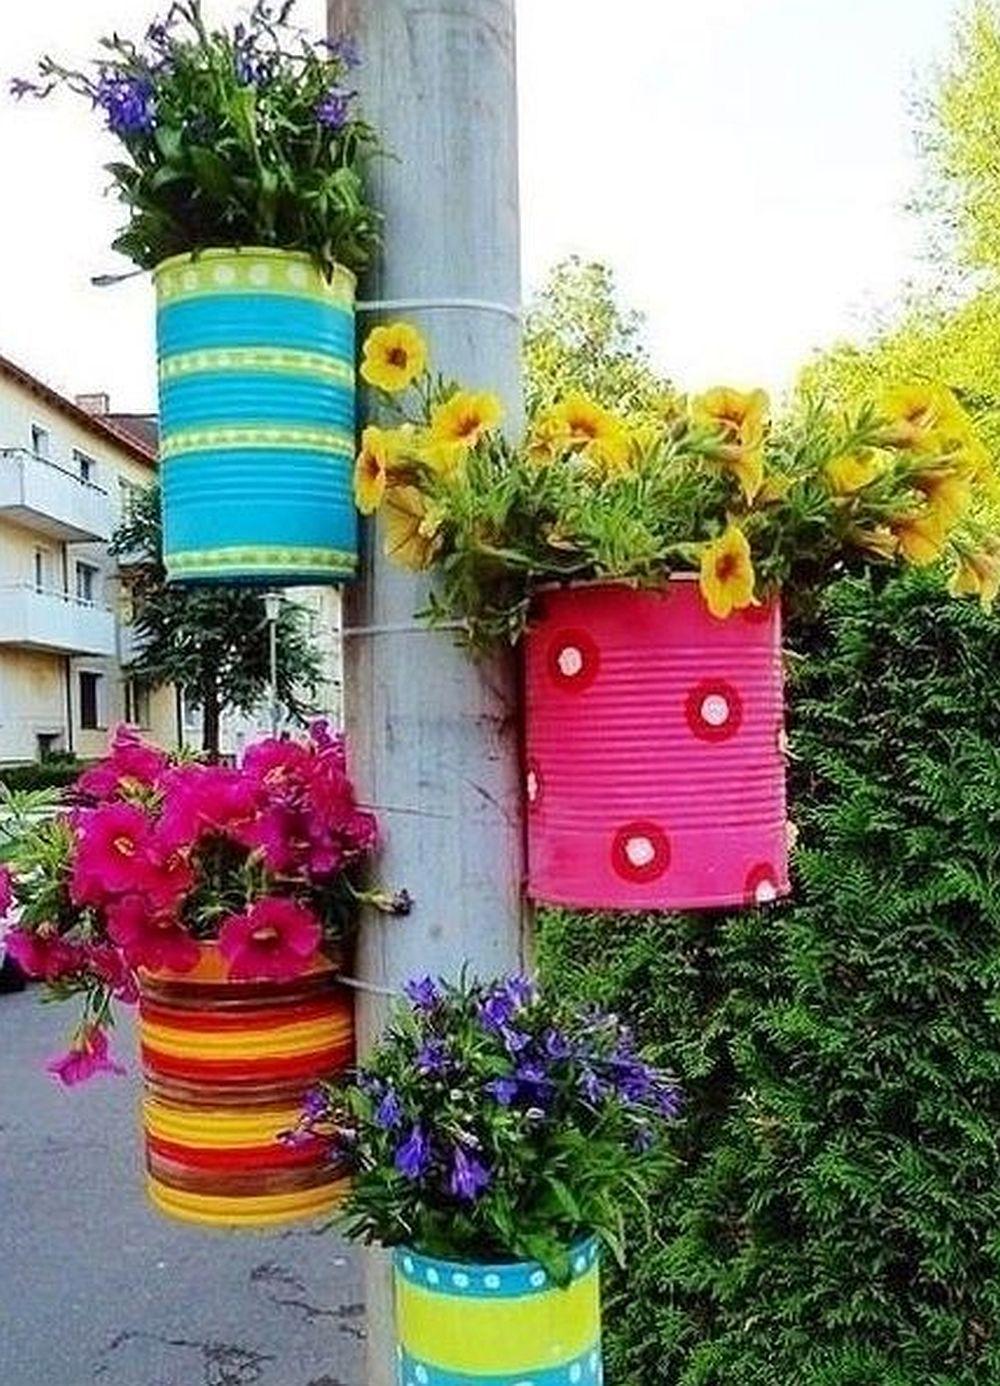 delaparvu.com despre ateliere gratuite de reciclare creativa, gradinarit si arata ambalarii (3)